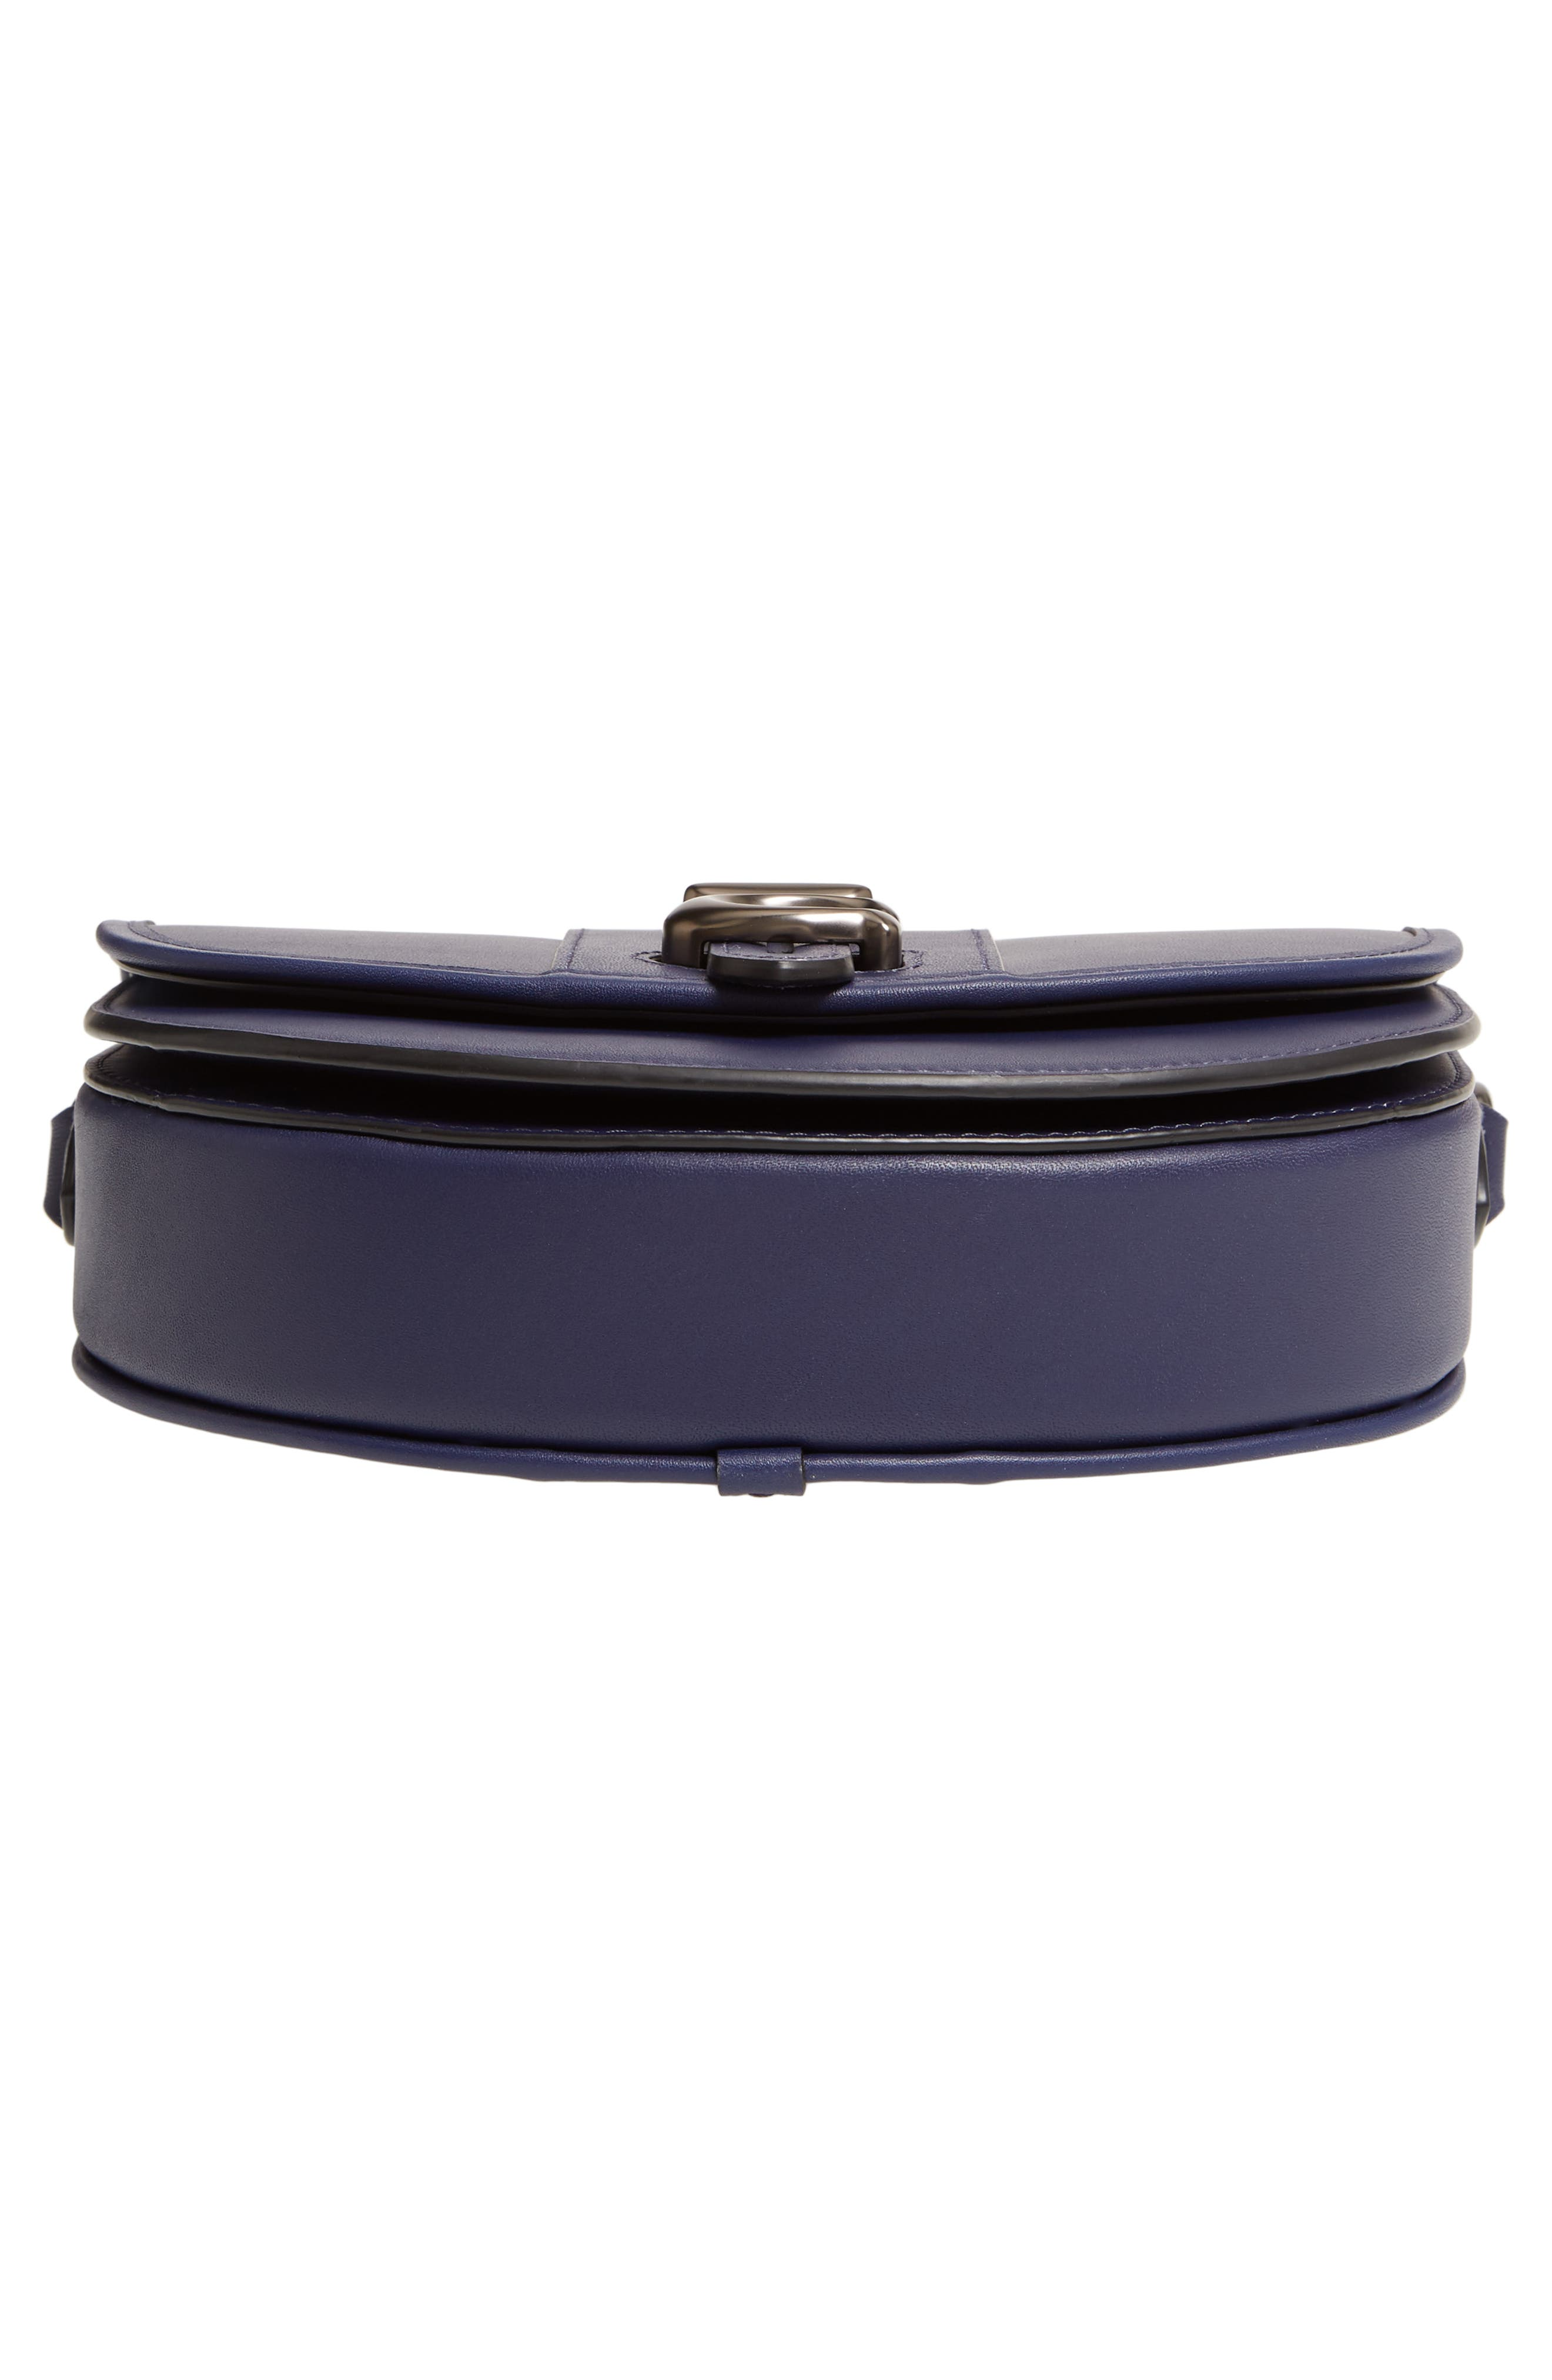 COACH, Saddle 20 Leather Saddle Bag, Alternate thumbnail 7, color, CADET